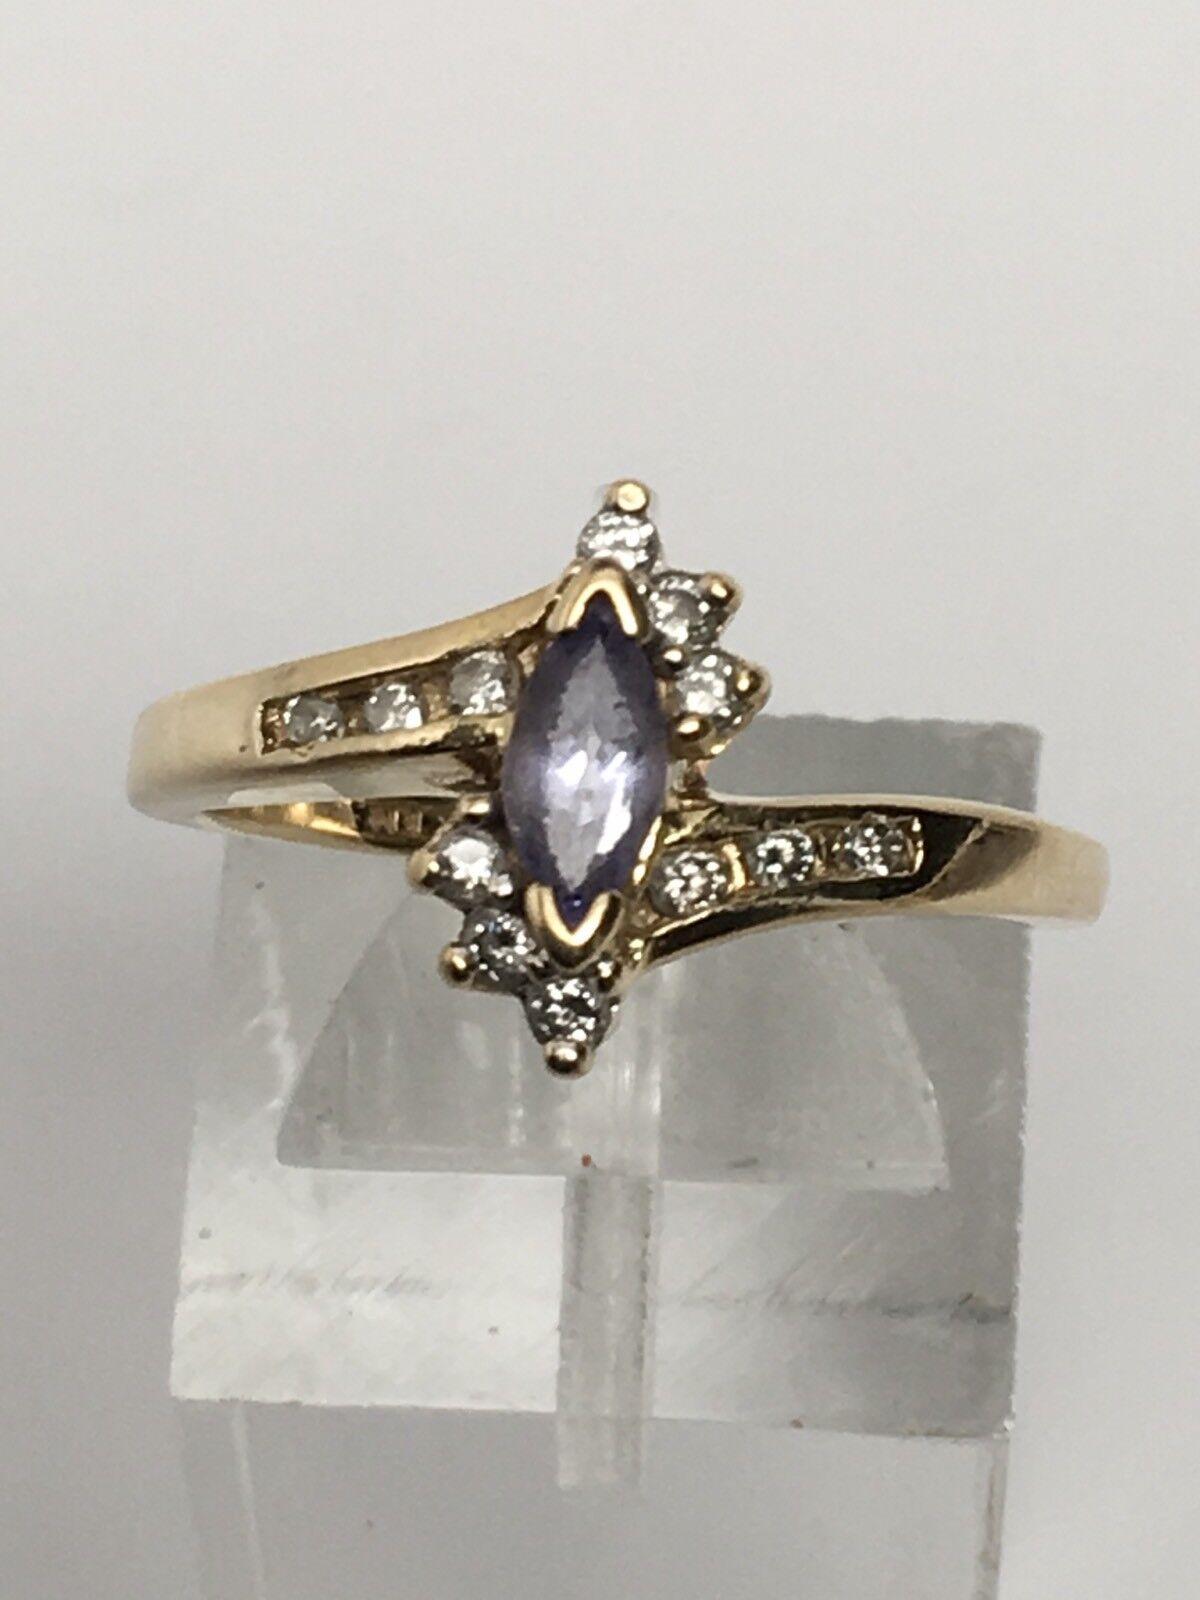 14K Yellow gold Marquise Shape Tanzanite and Natural Diamond Ring Size 6.5